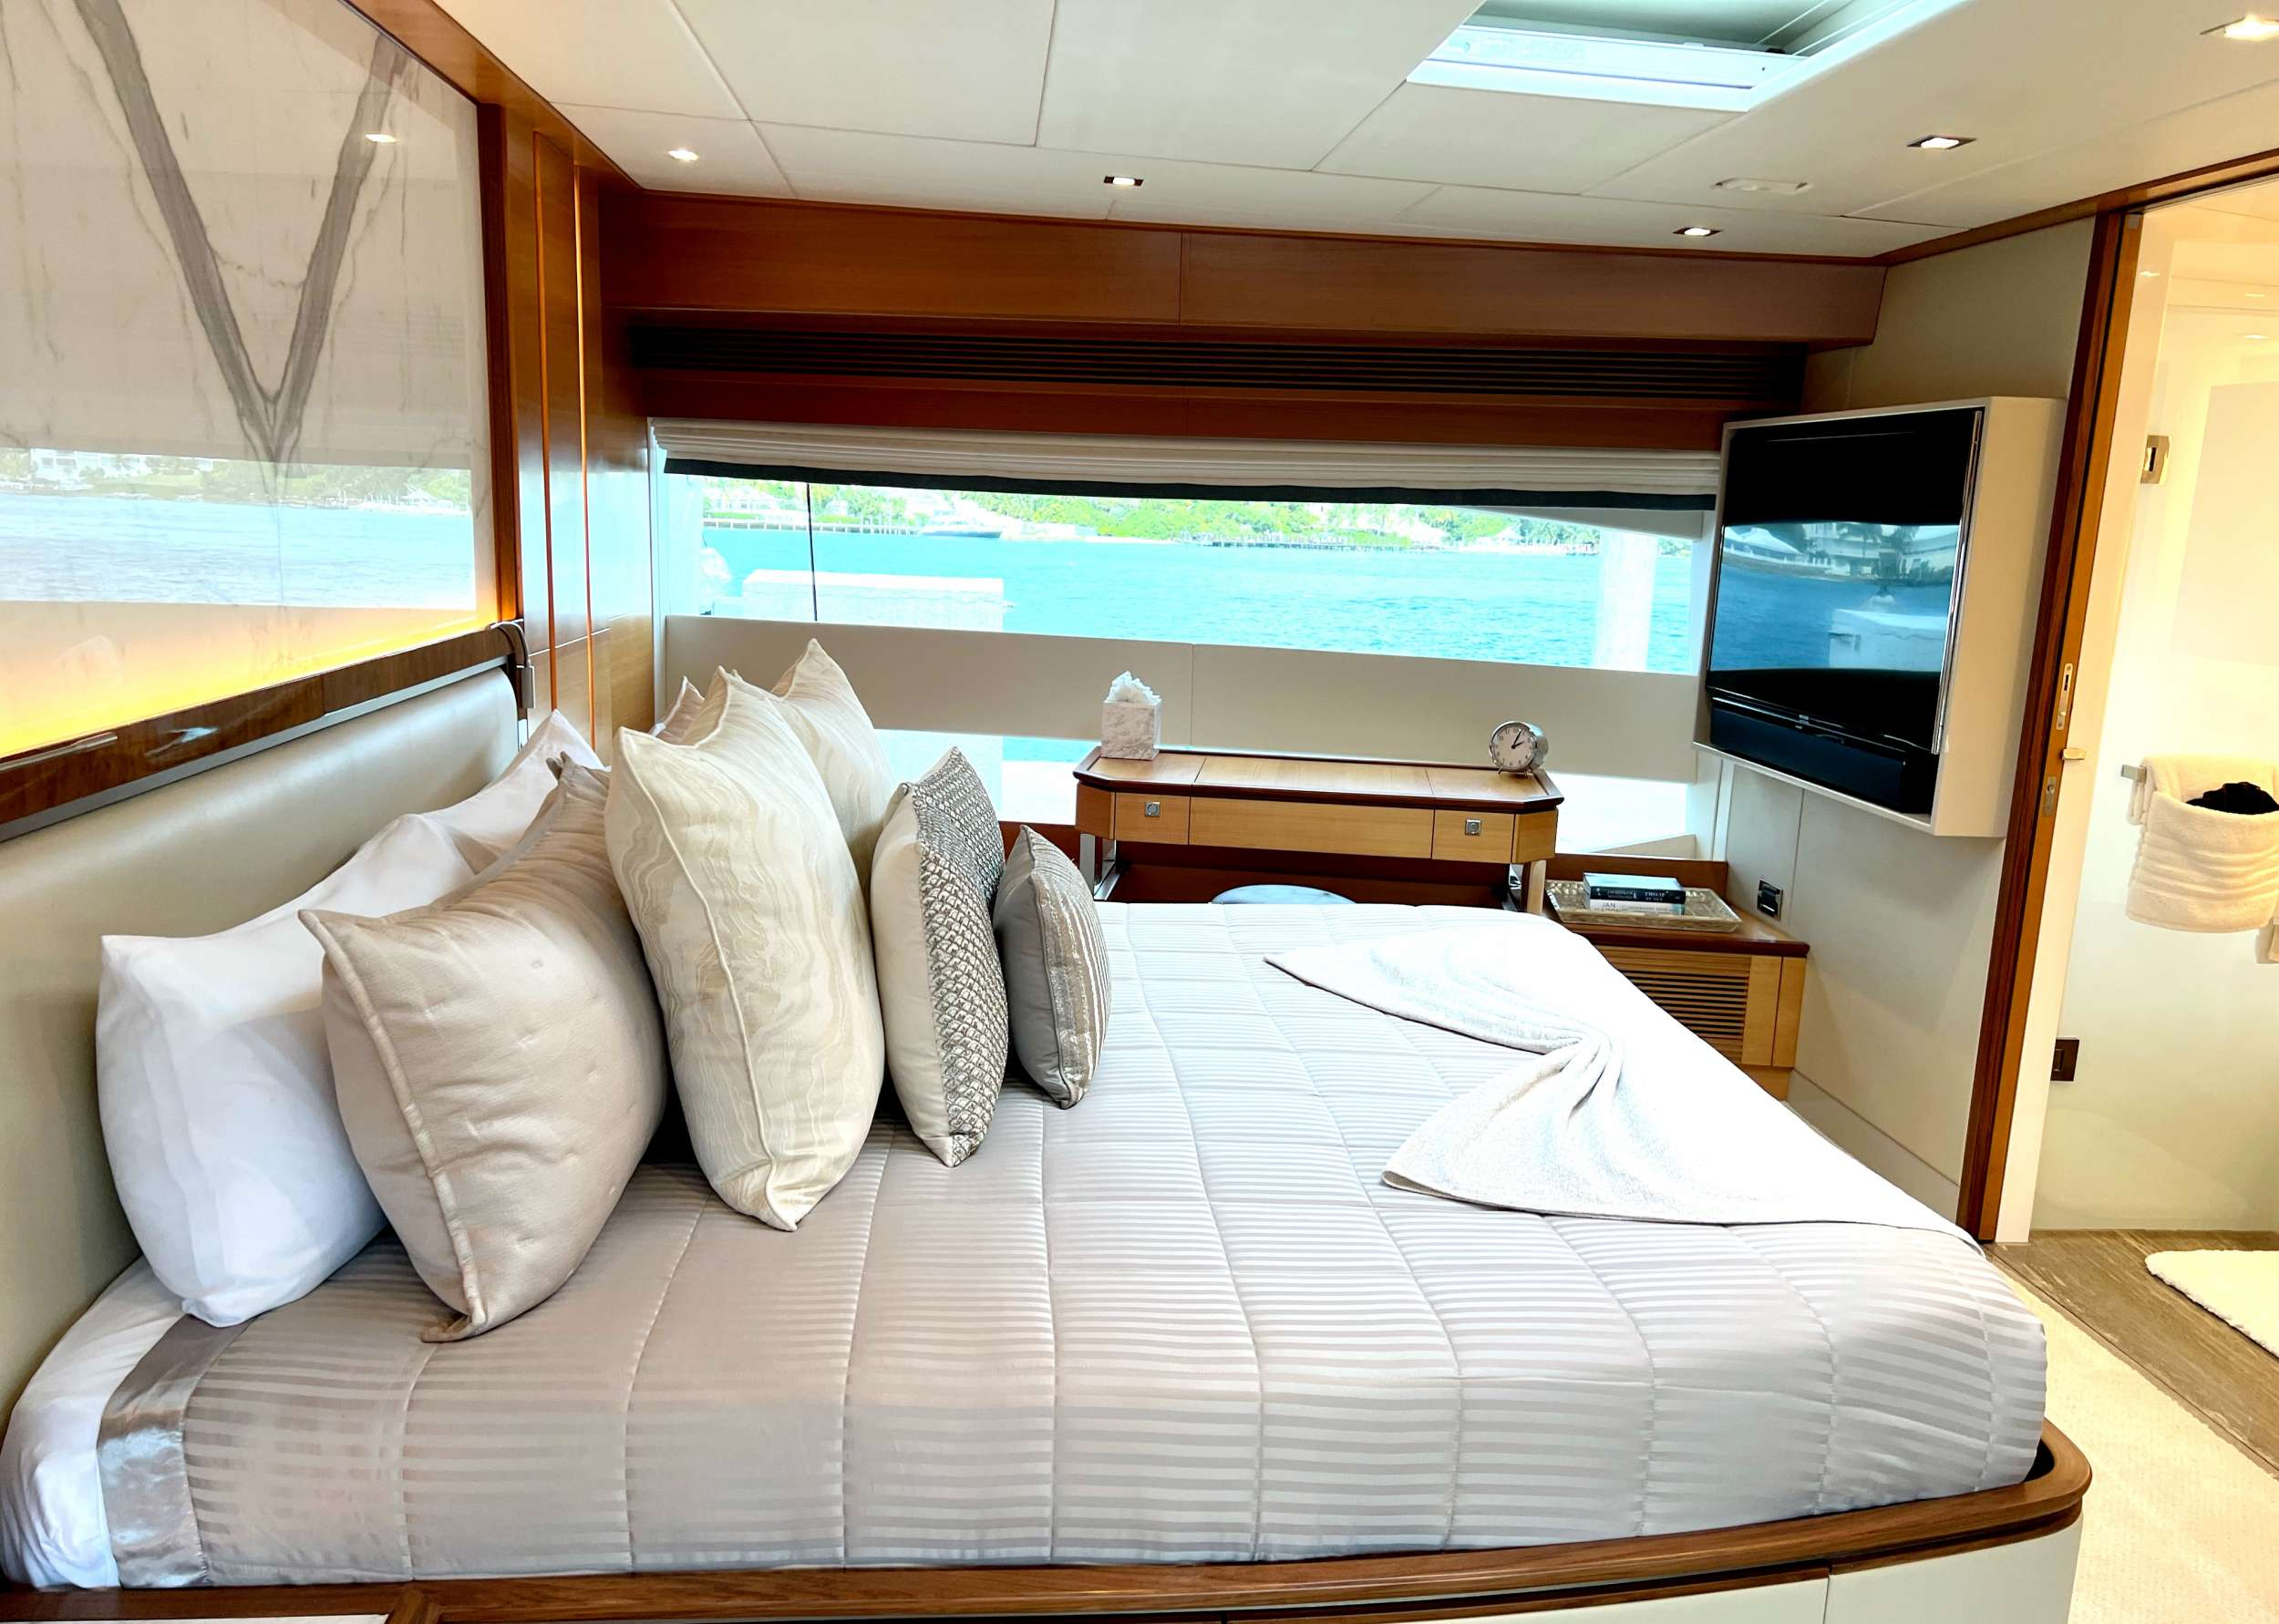 SEAGLASS 74 yacht image # 5